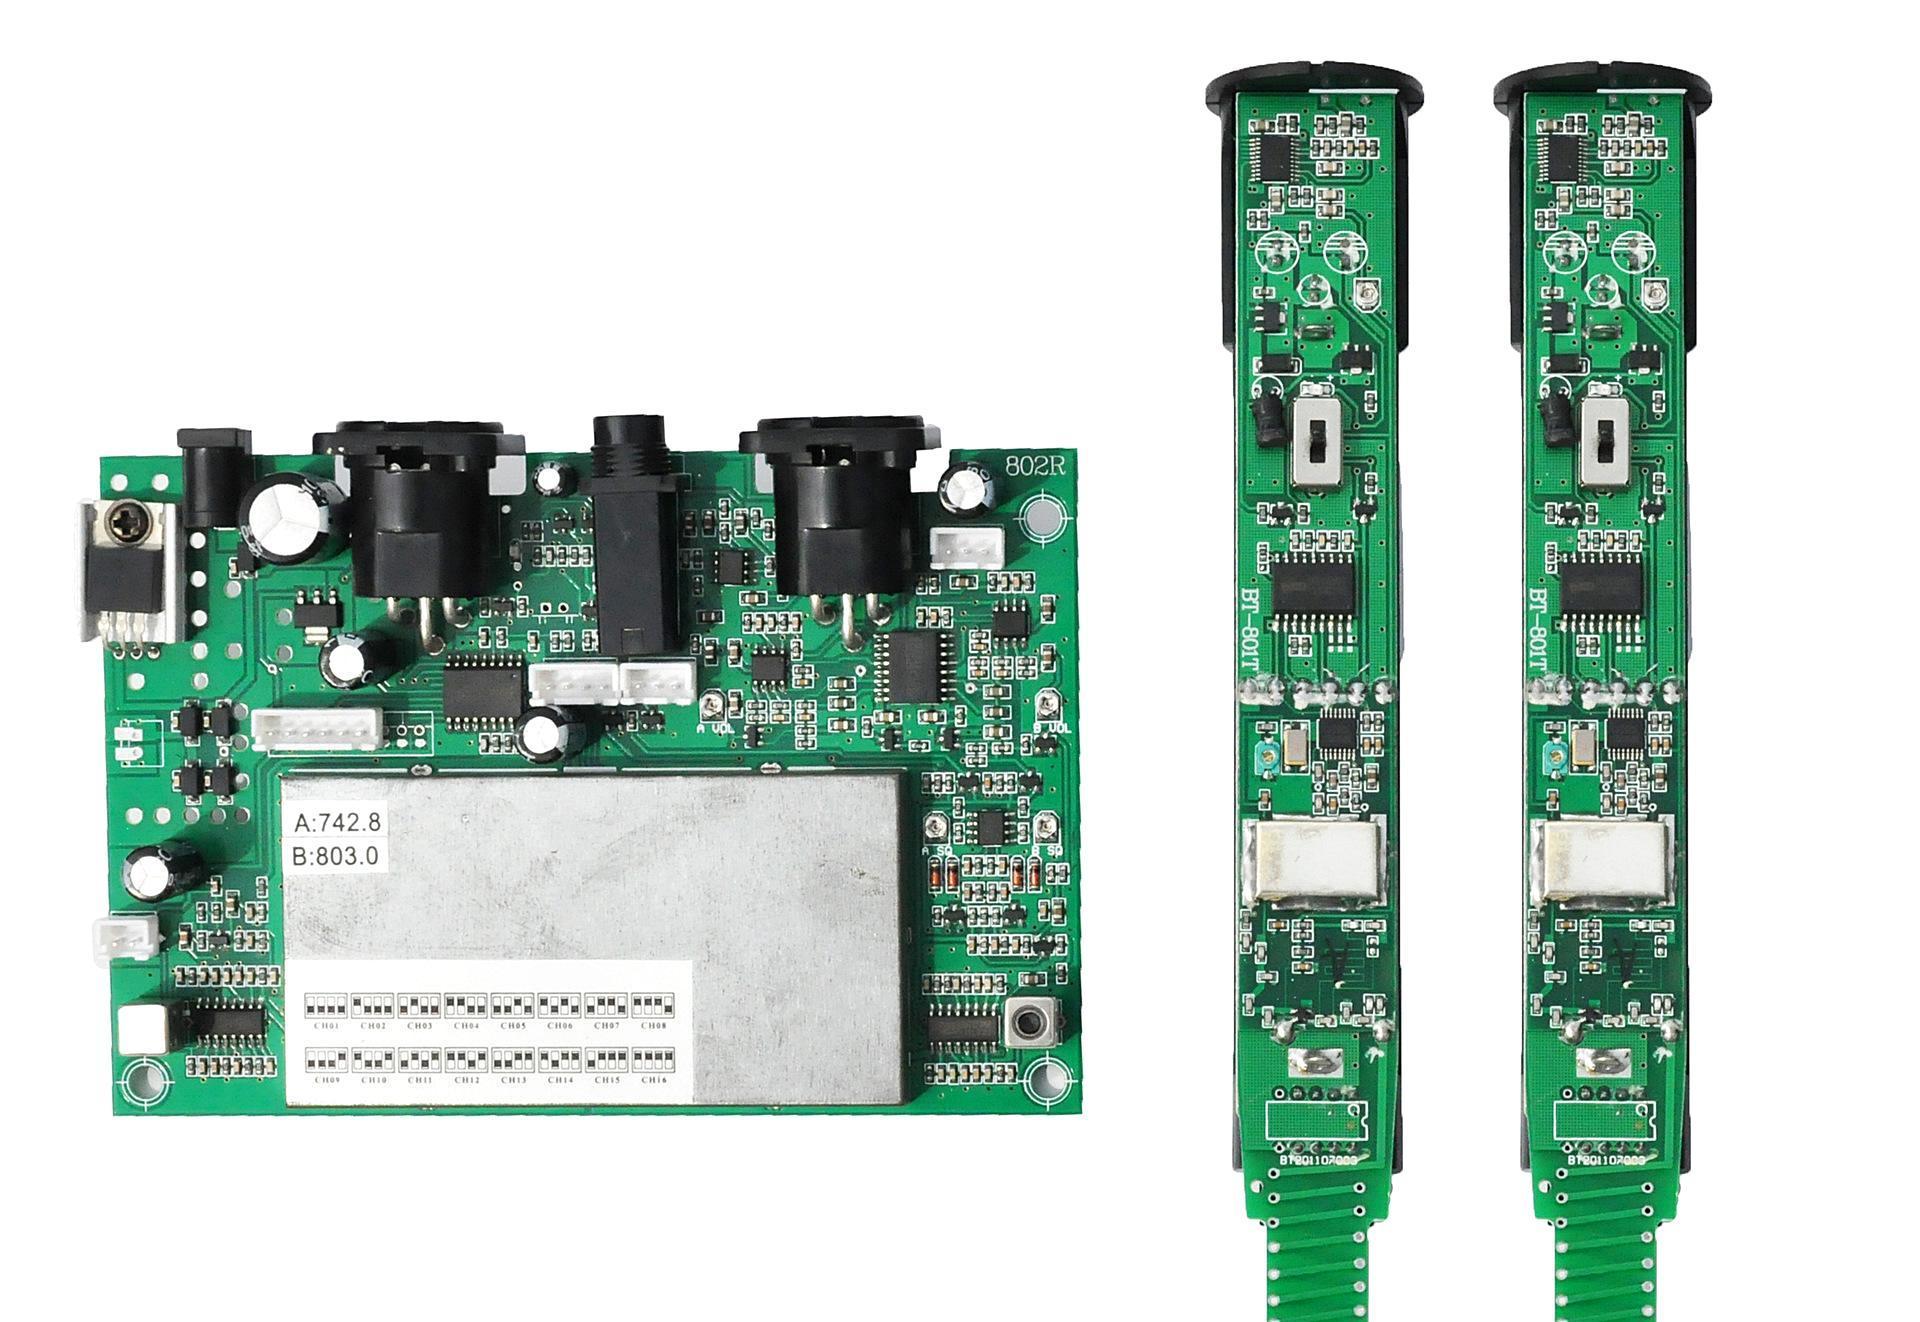 uk-110m uhf1拖1固频无线麦克风模块 无线话筒模块 电路板